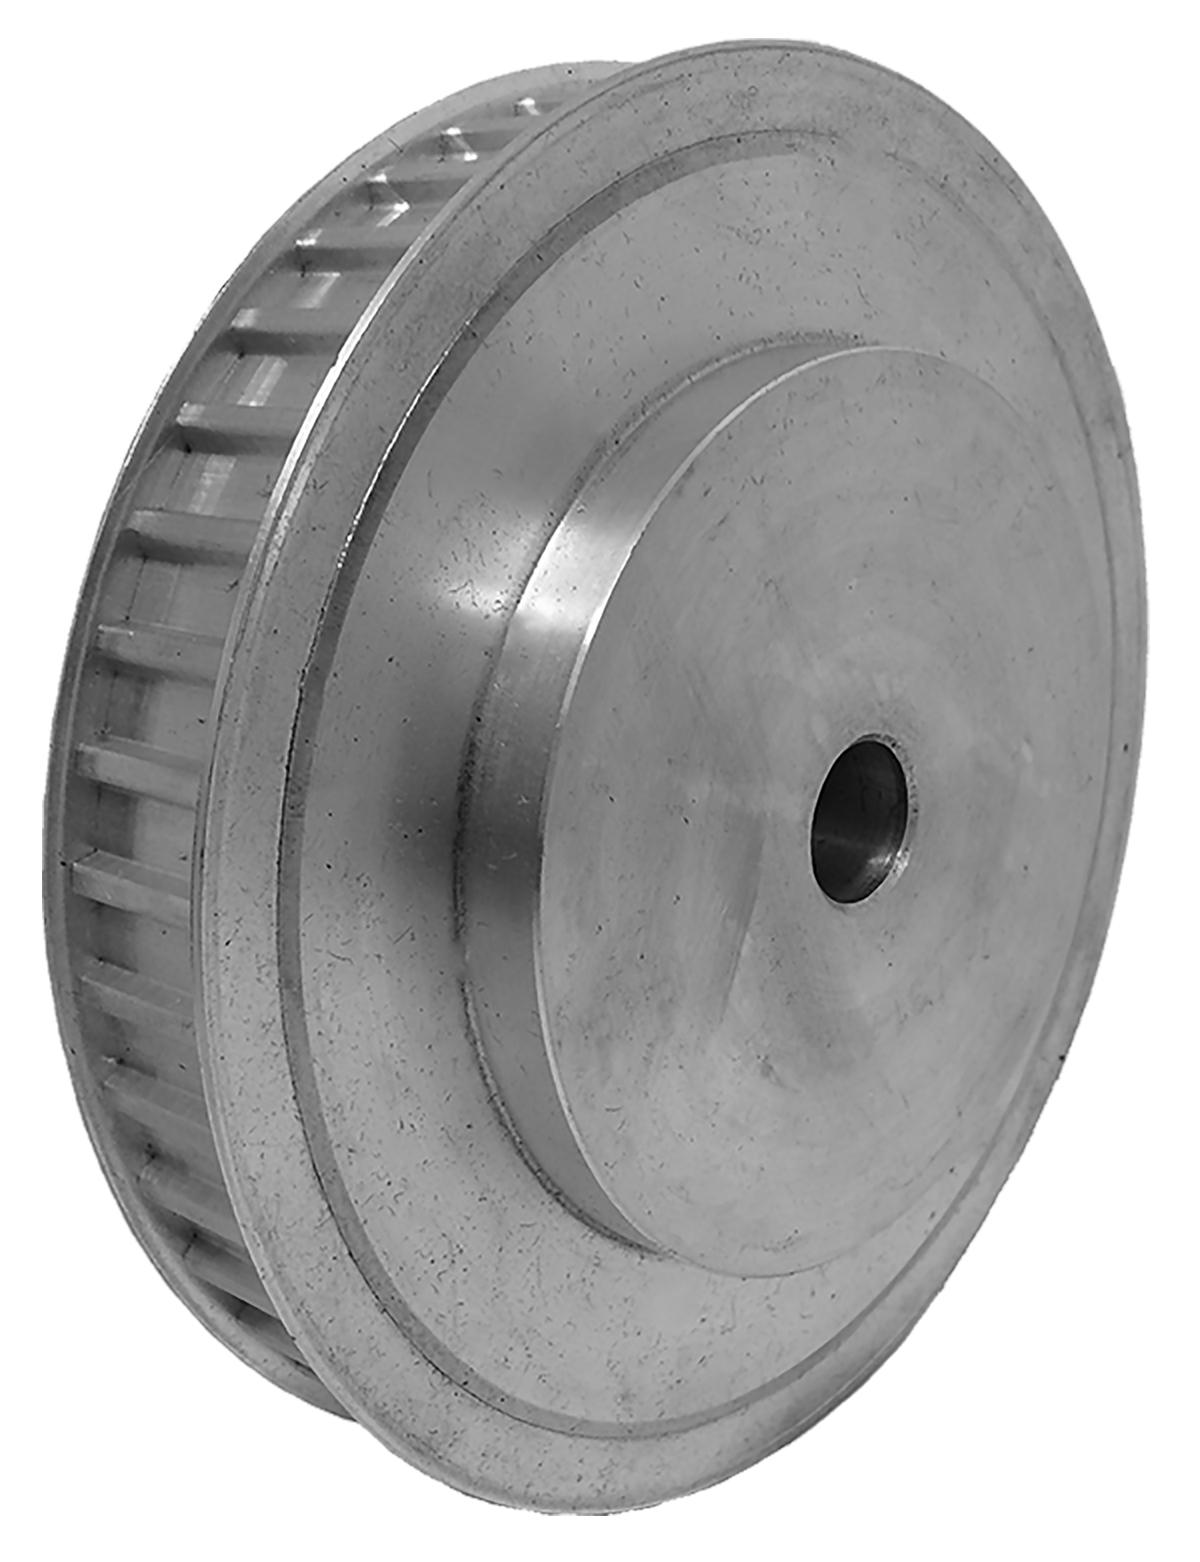 31AT10/44-2 - Aluminum Metric Pulleys